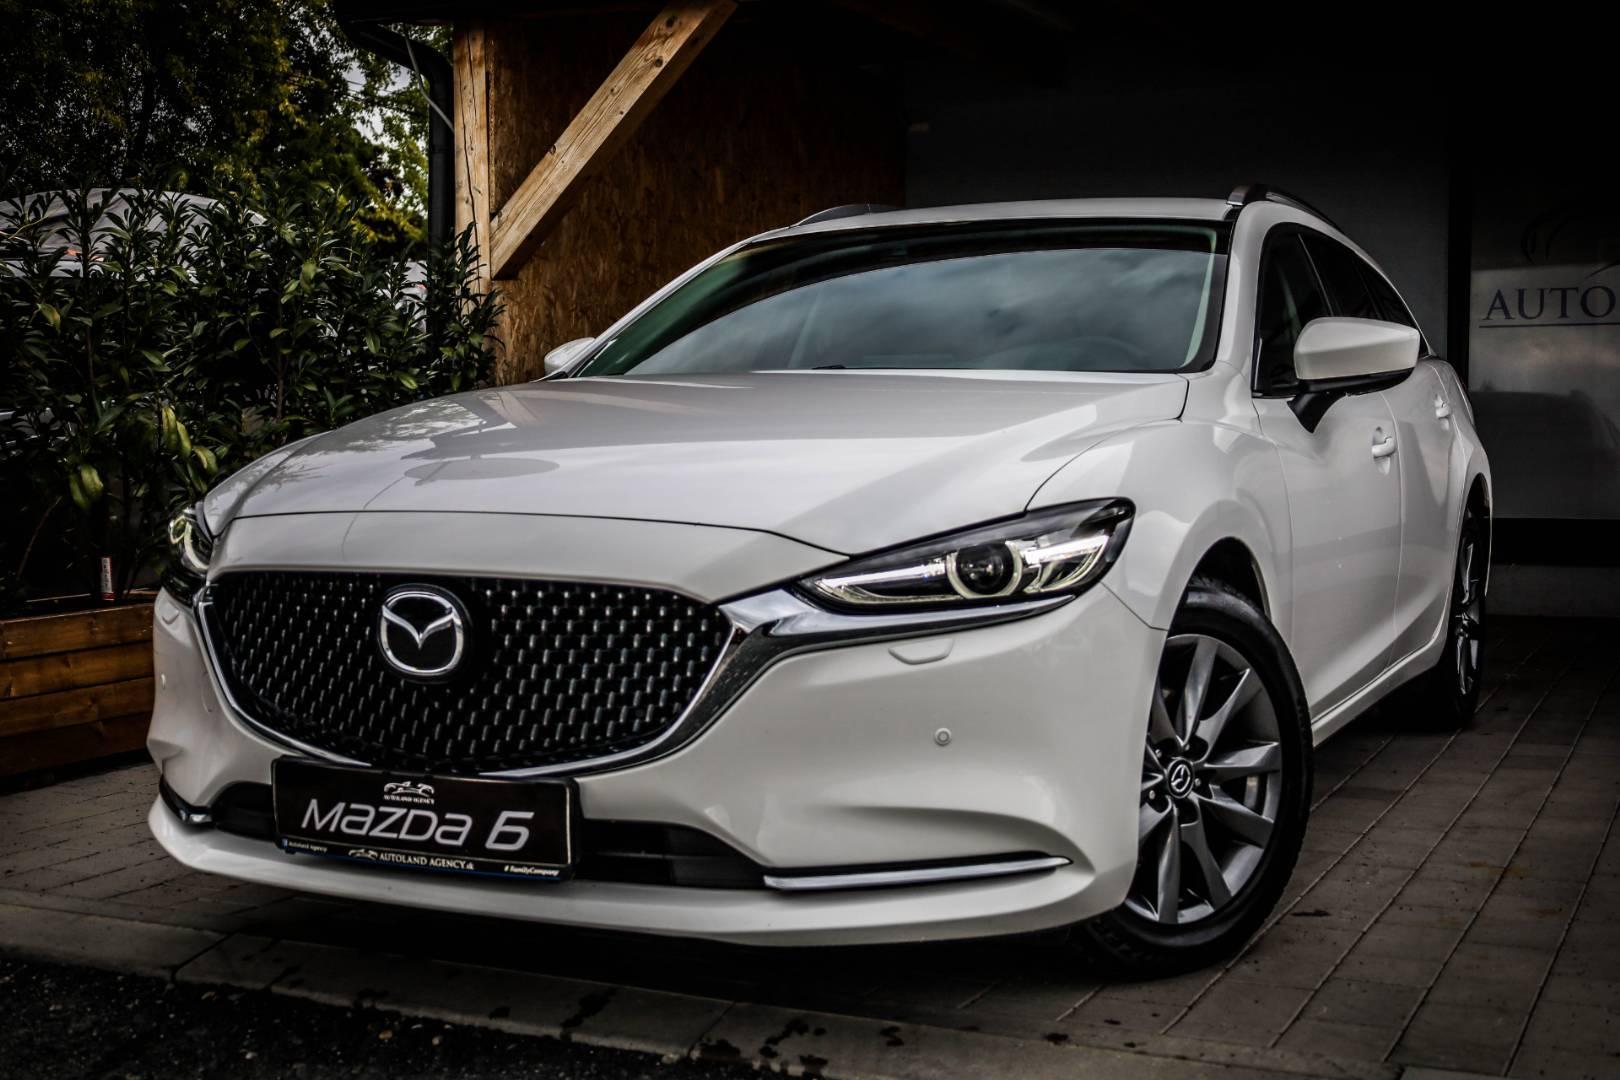 Mazda 6 Combi (Wagon) 6 2.5 Skyactiv-G194 Attraction A/T